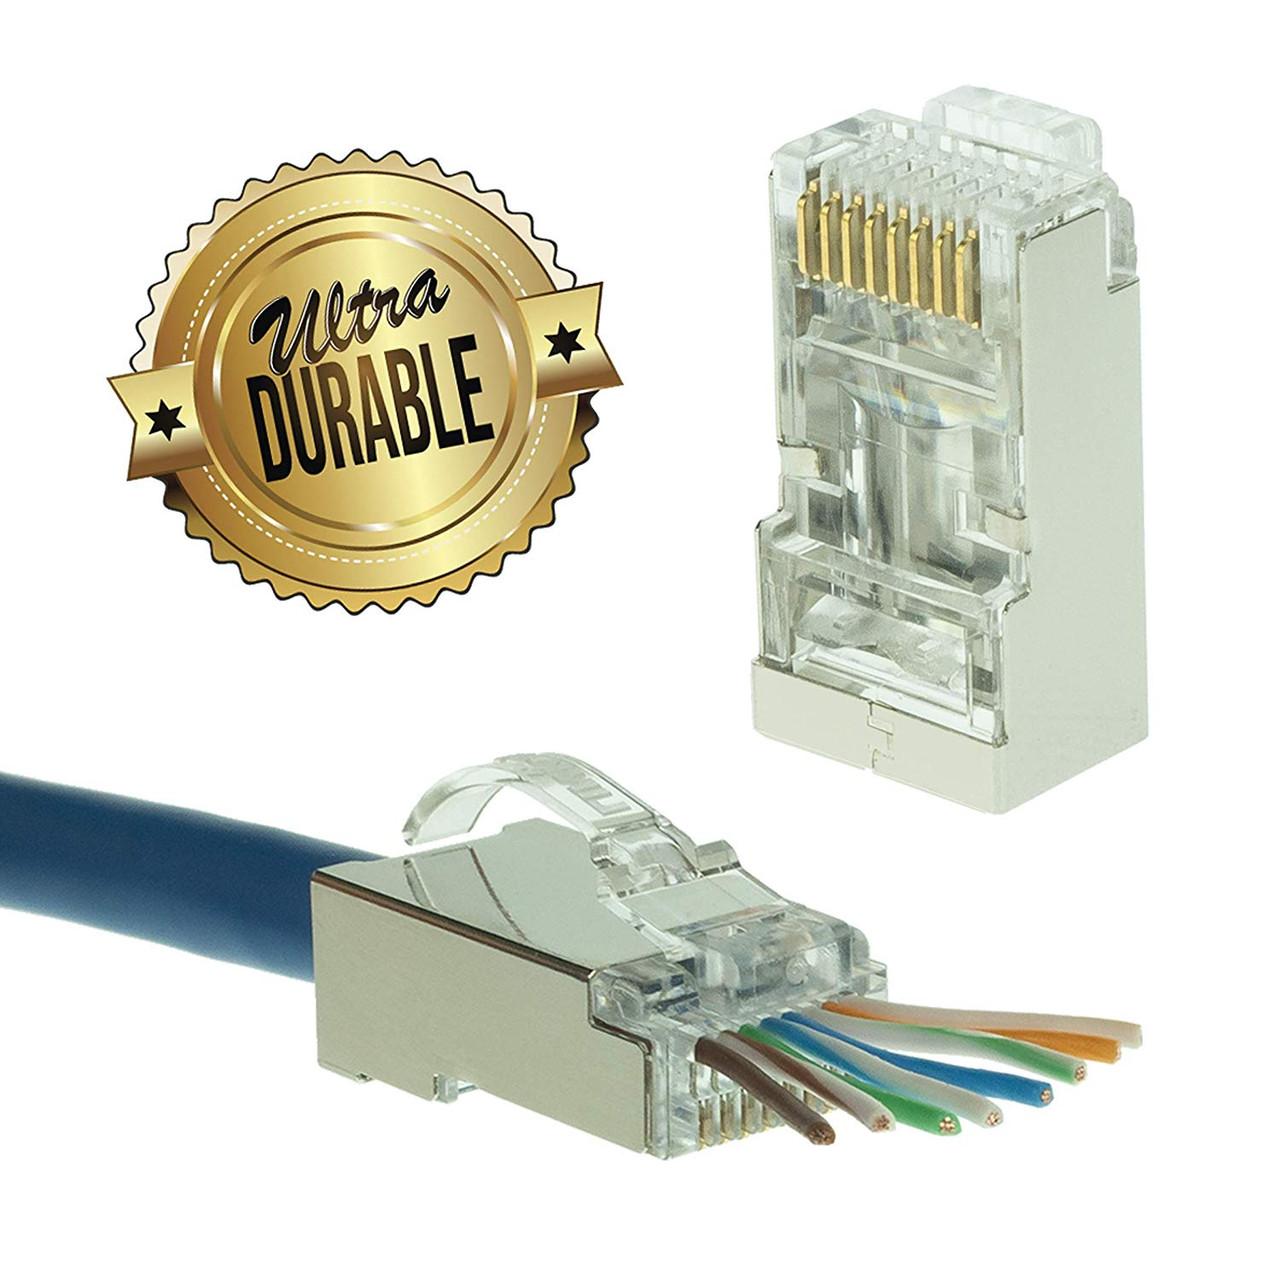 Platinum Tools EZ RJ45 Crimp LAN Network Connectors for CAT6 Pack of 100